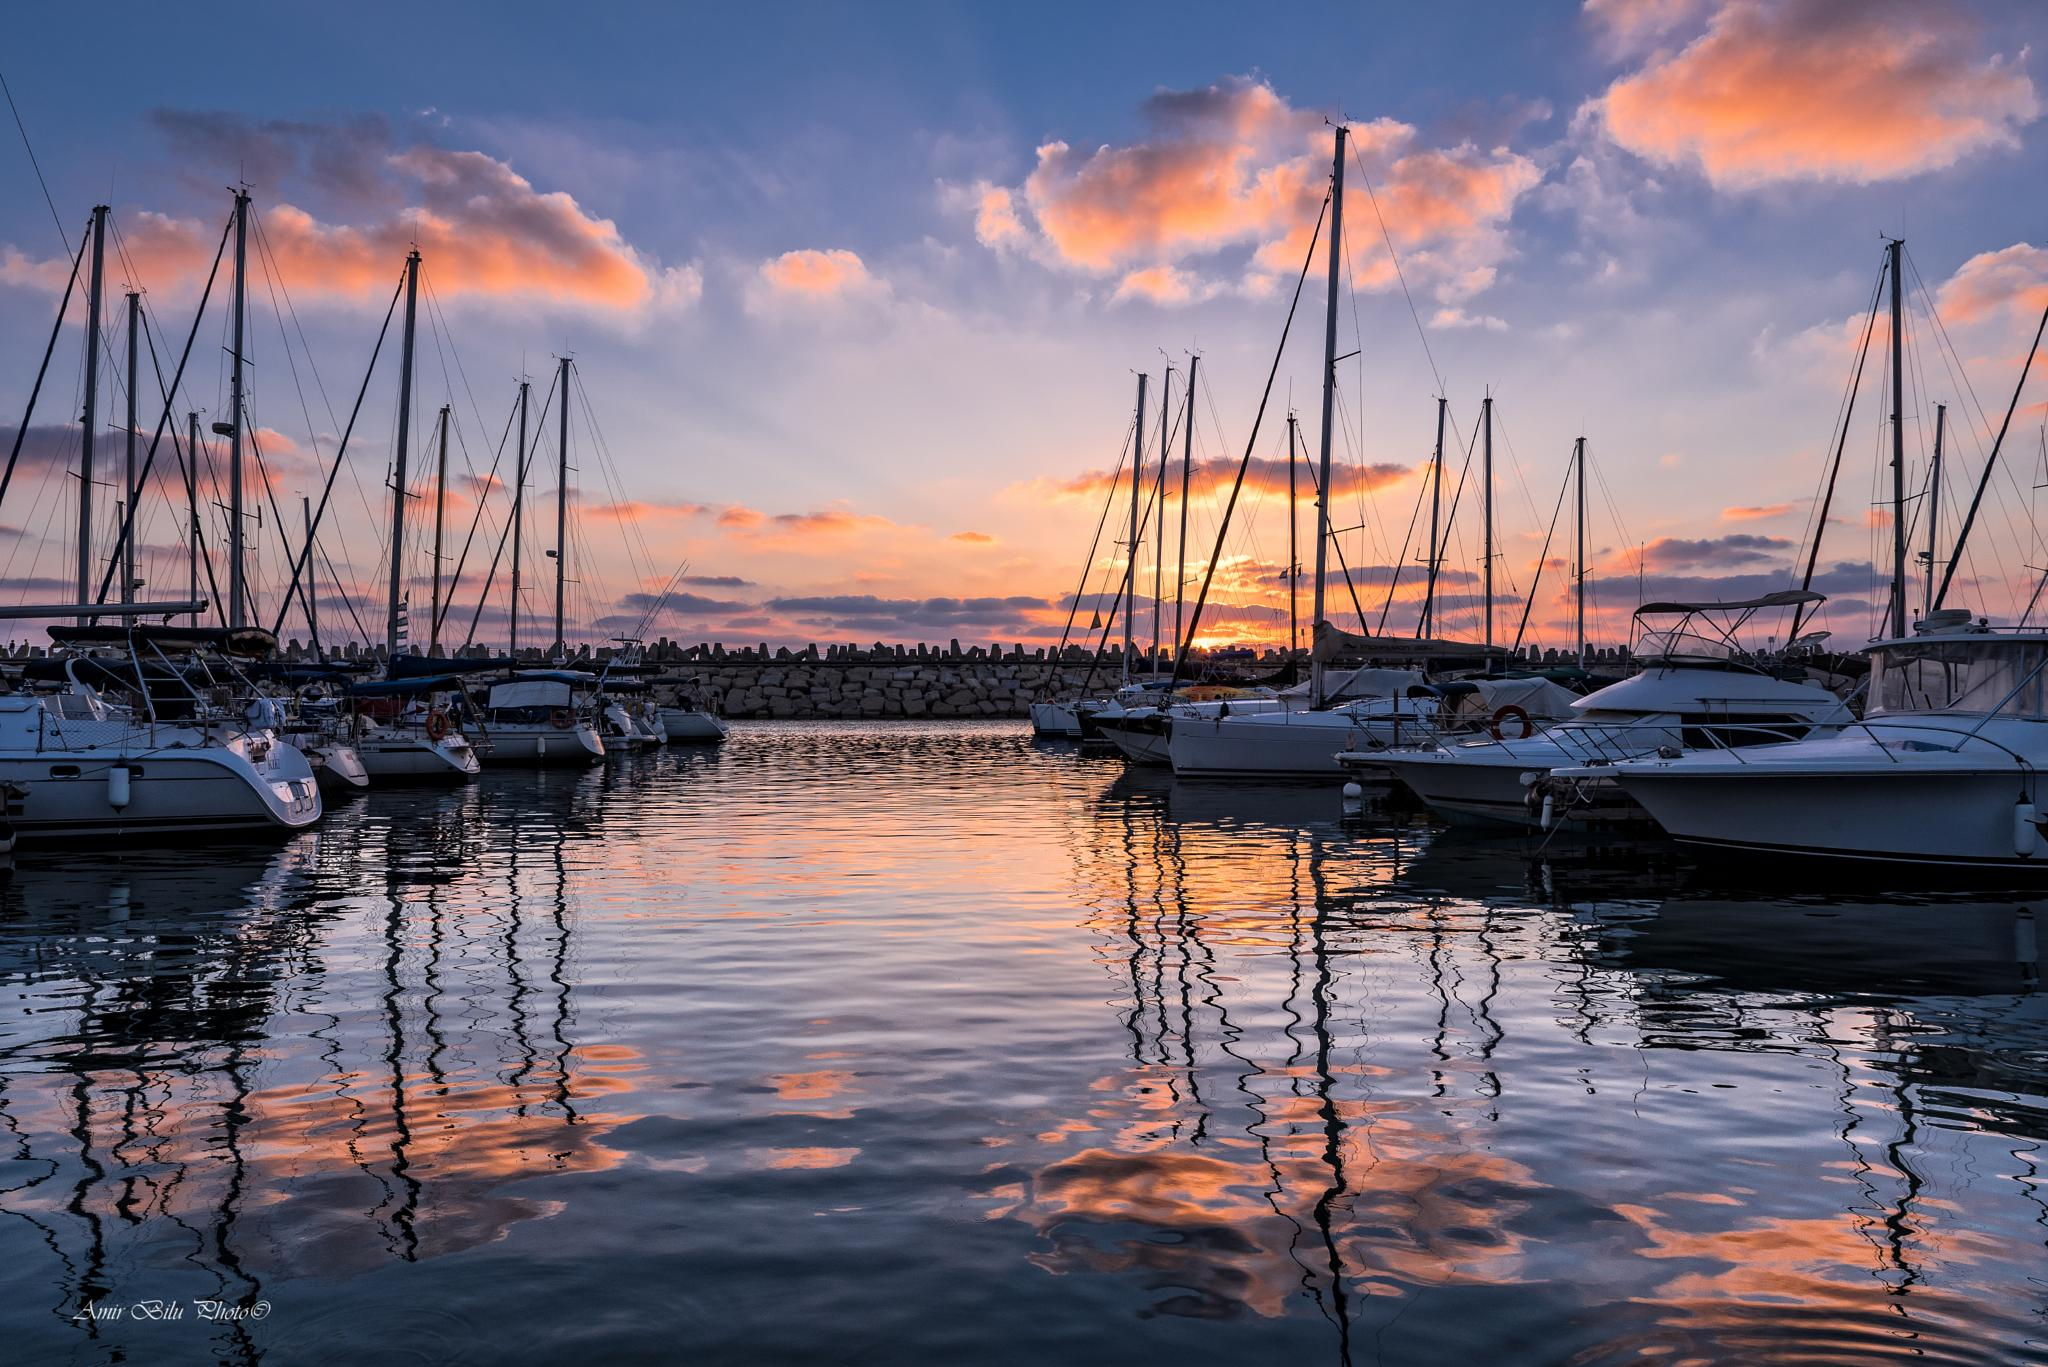 Sunset  by Amir Bilu